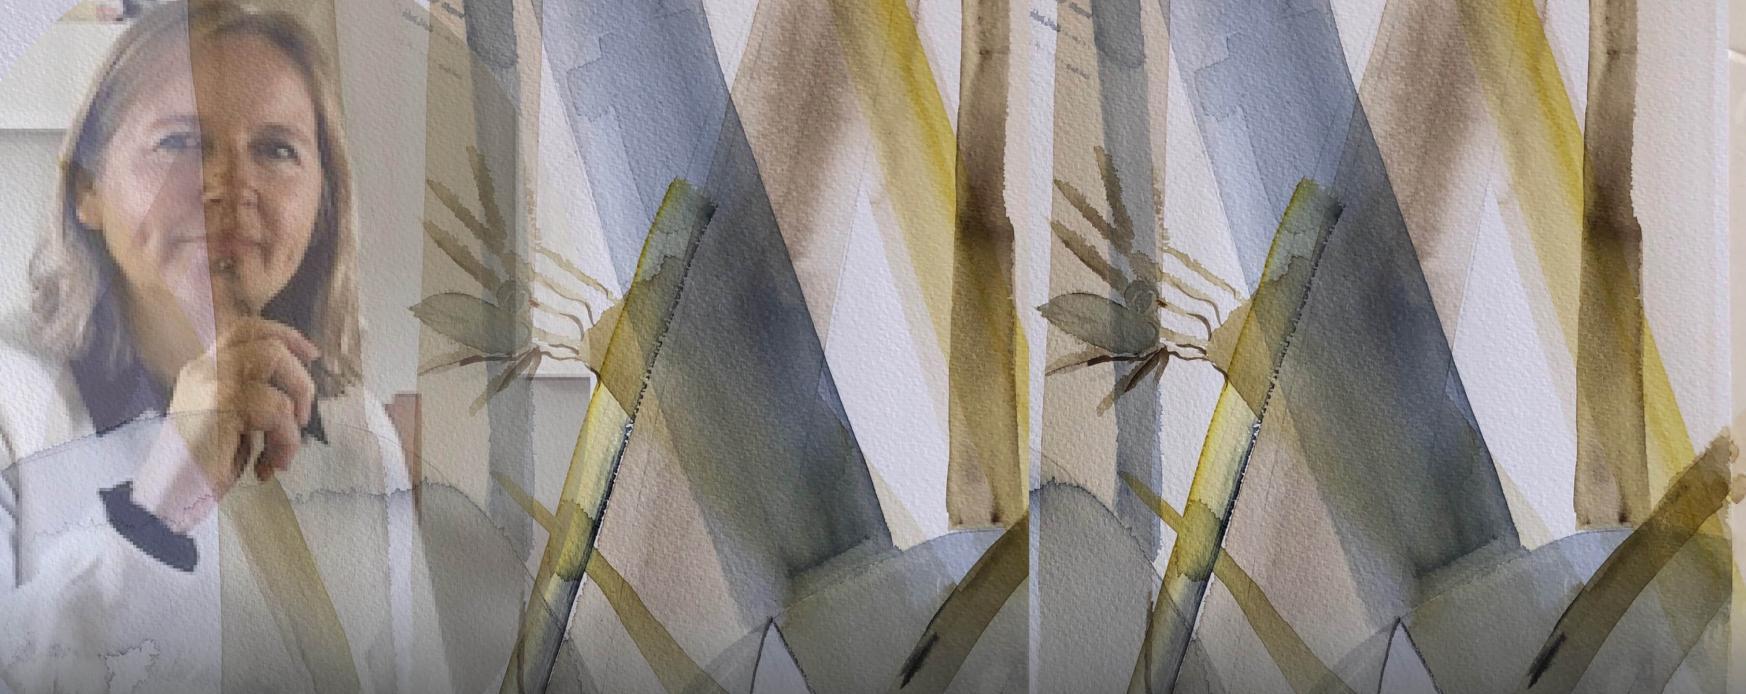 "Marlene Lindbäck presents digital exhibition ""Calm Energy"" at nipa.ax"